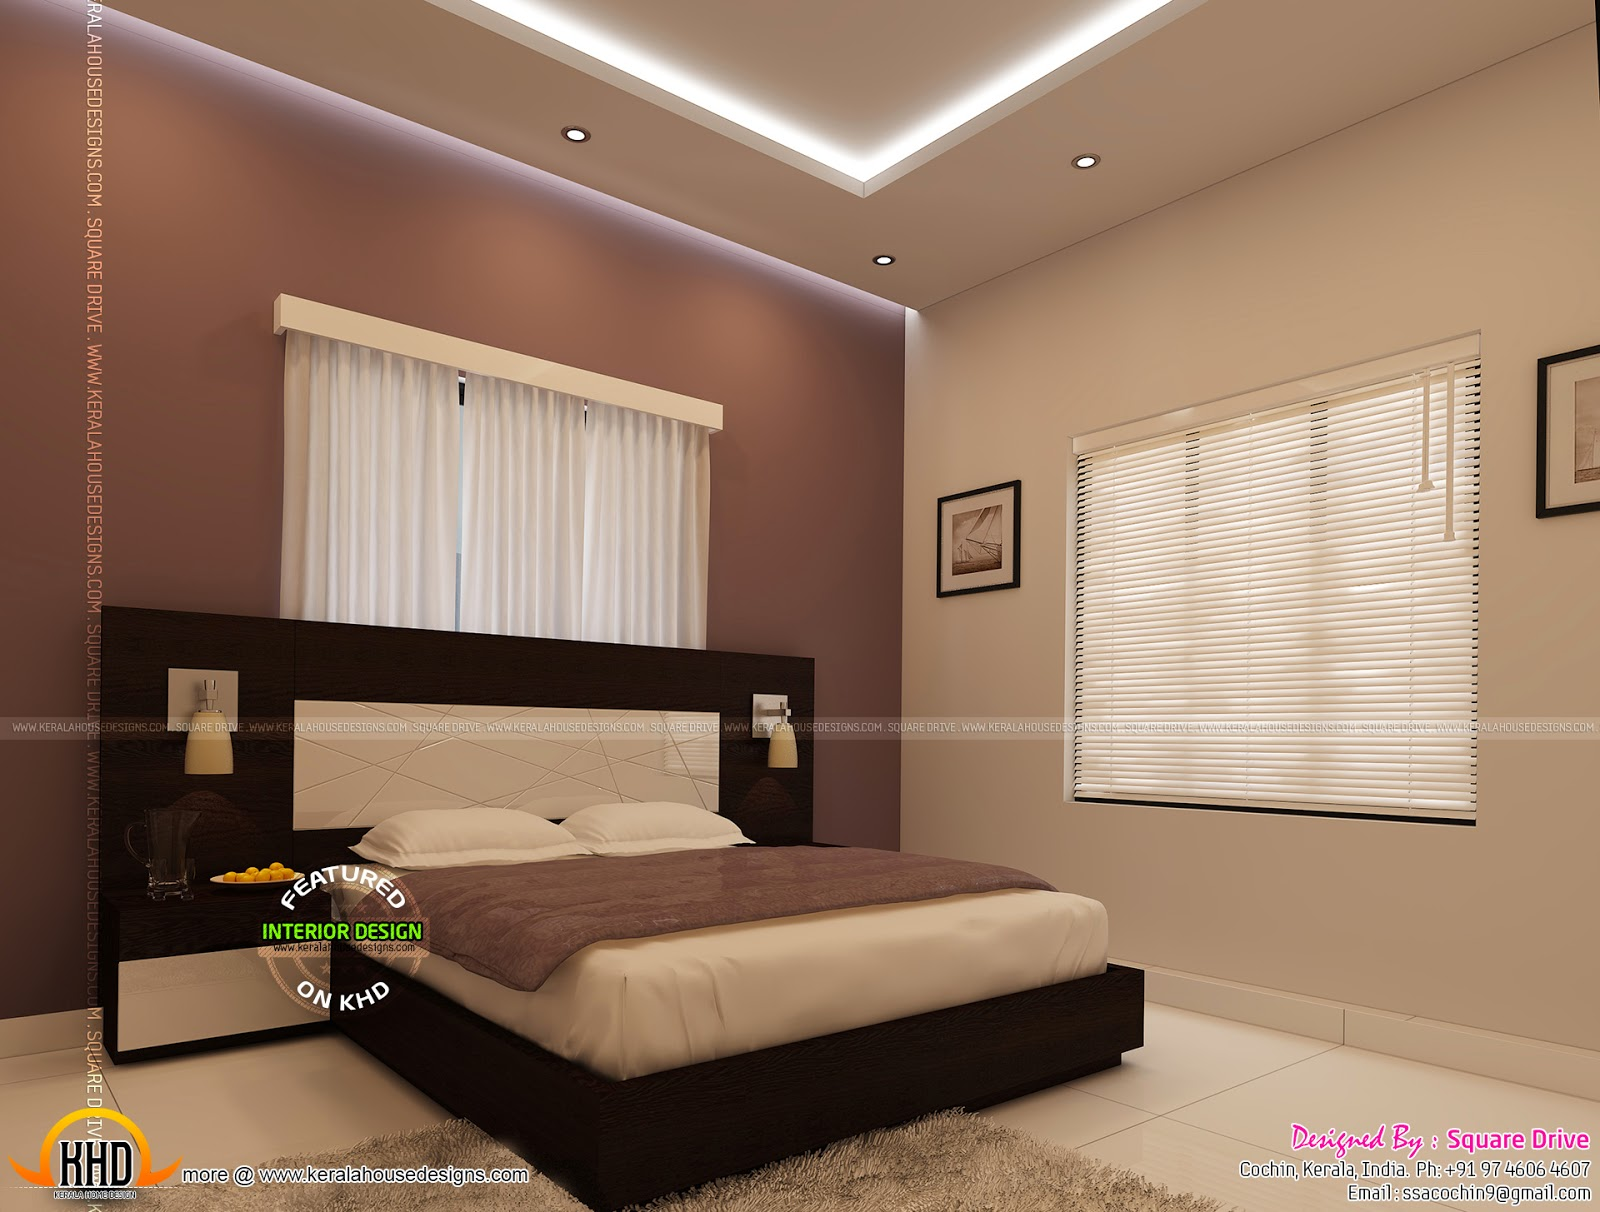 bedroom interior designs kerala home design and floor plans